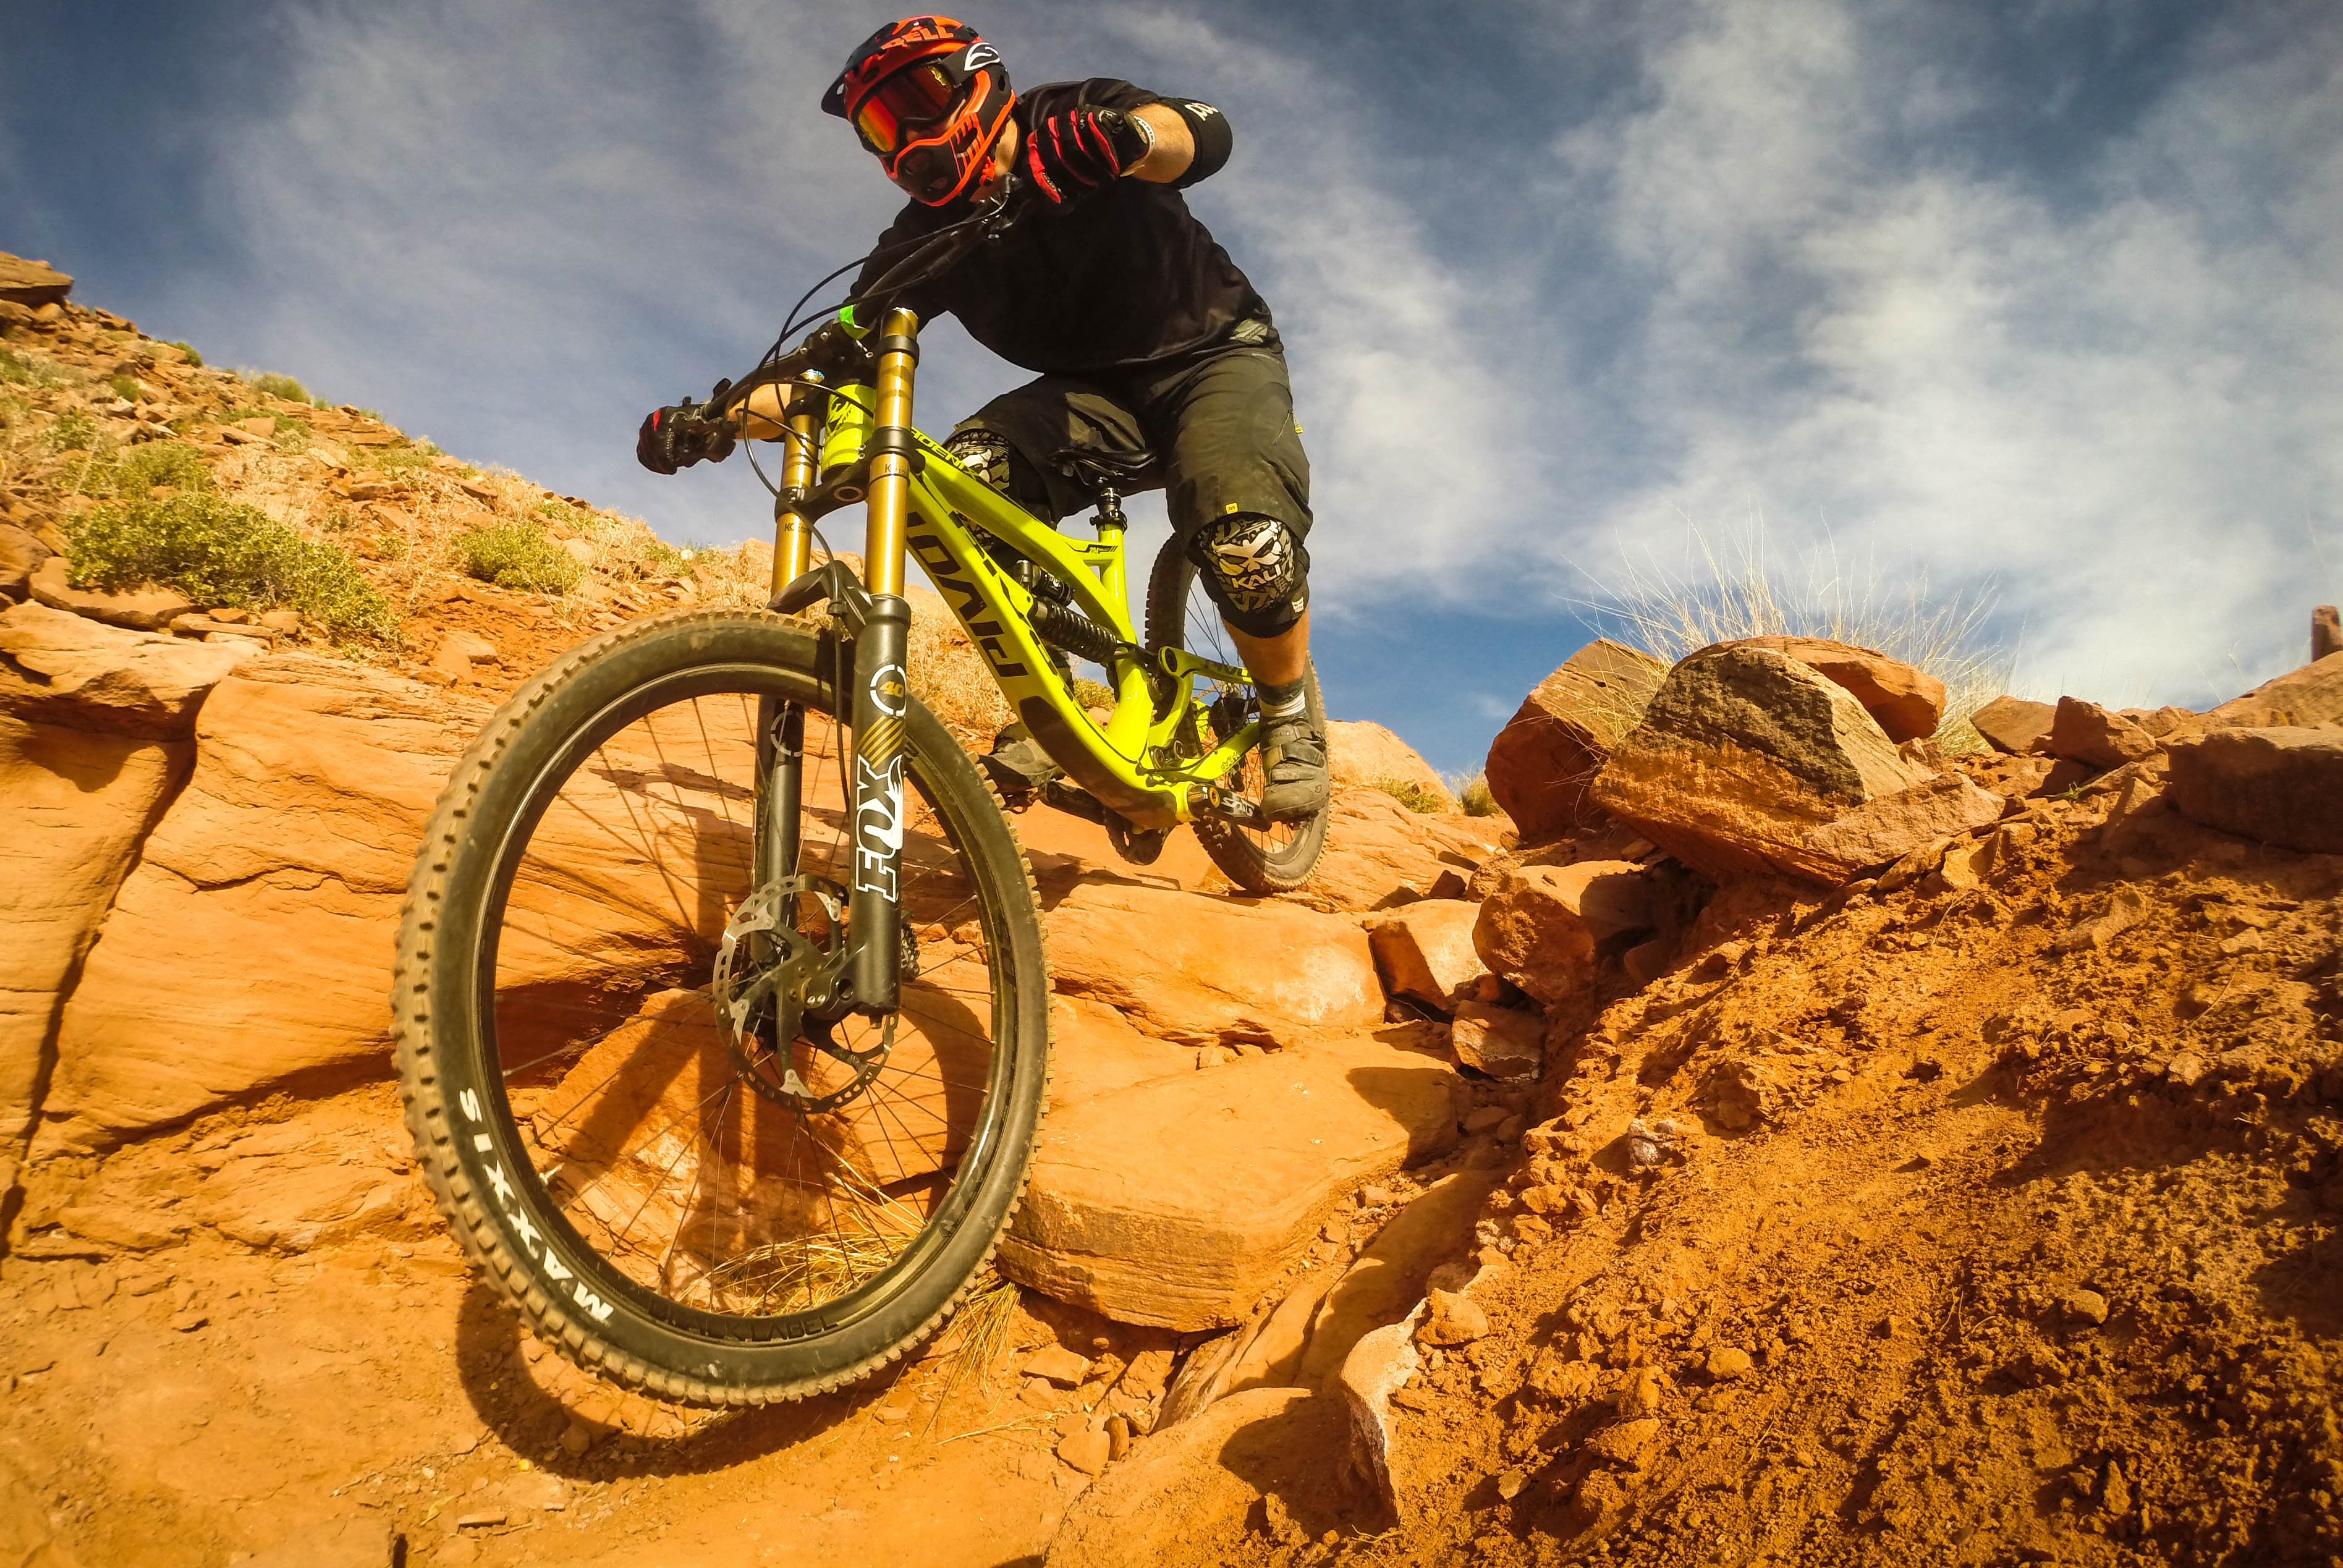 Explore Mountain Bike Trails of Moab with Rental Bikes